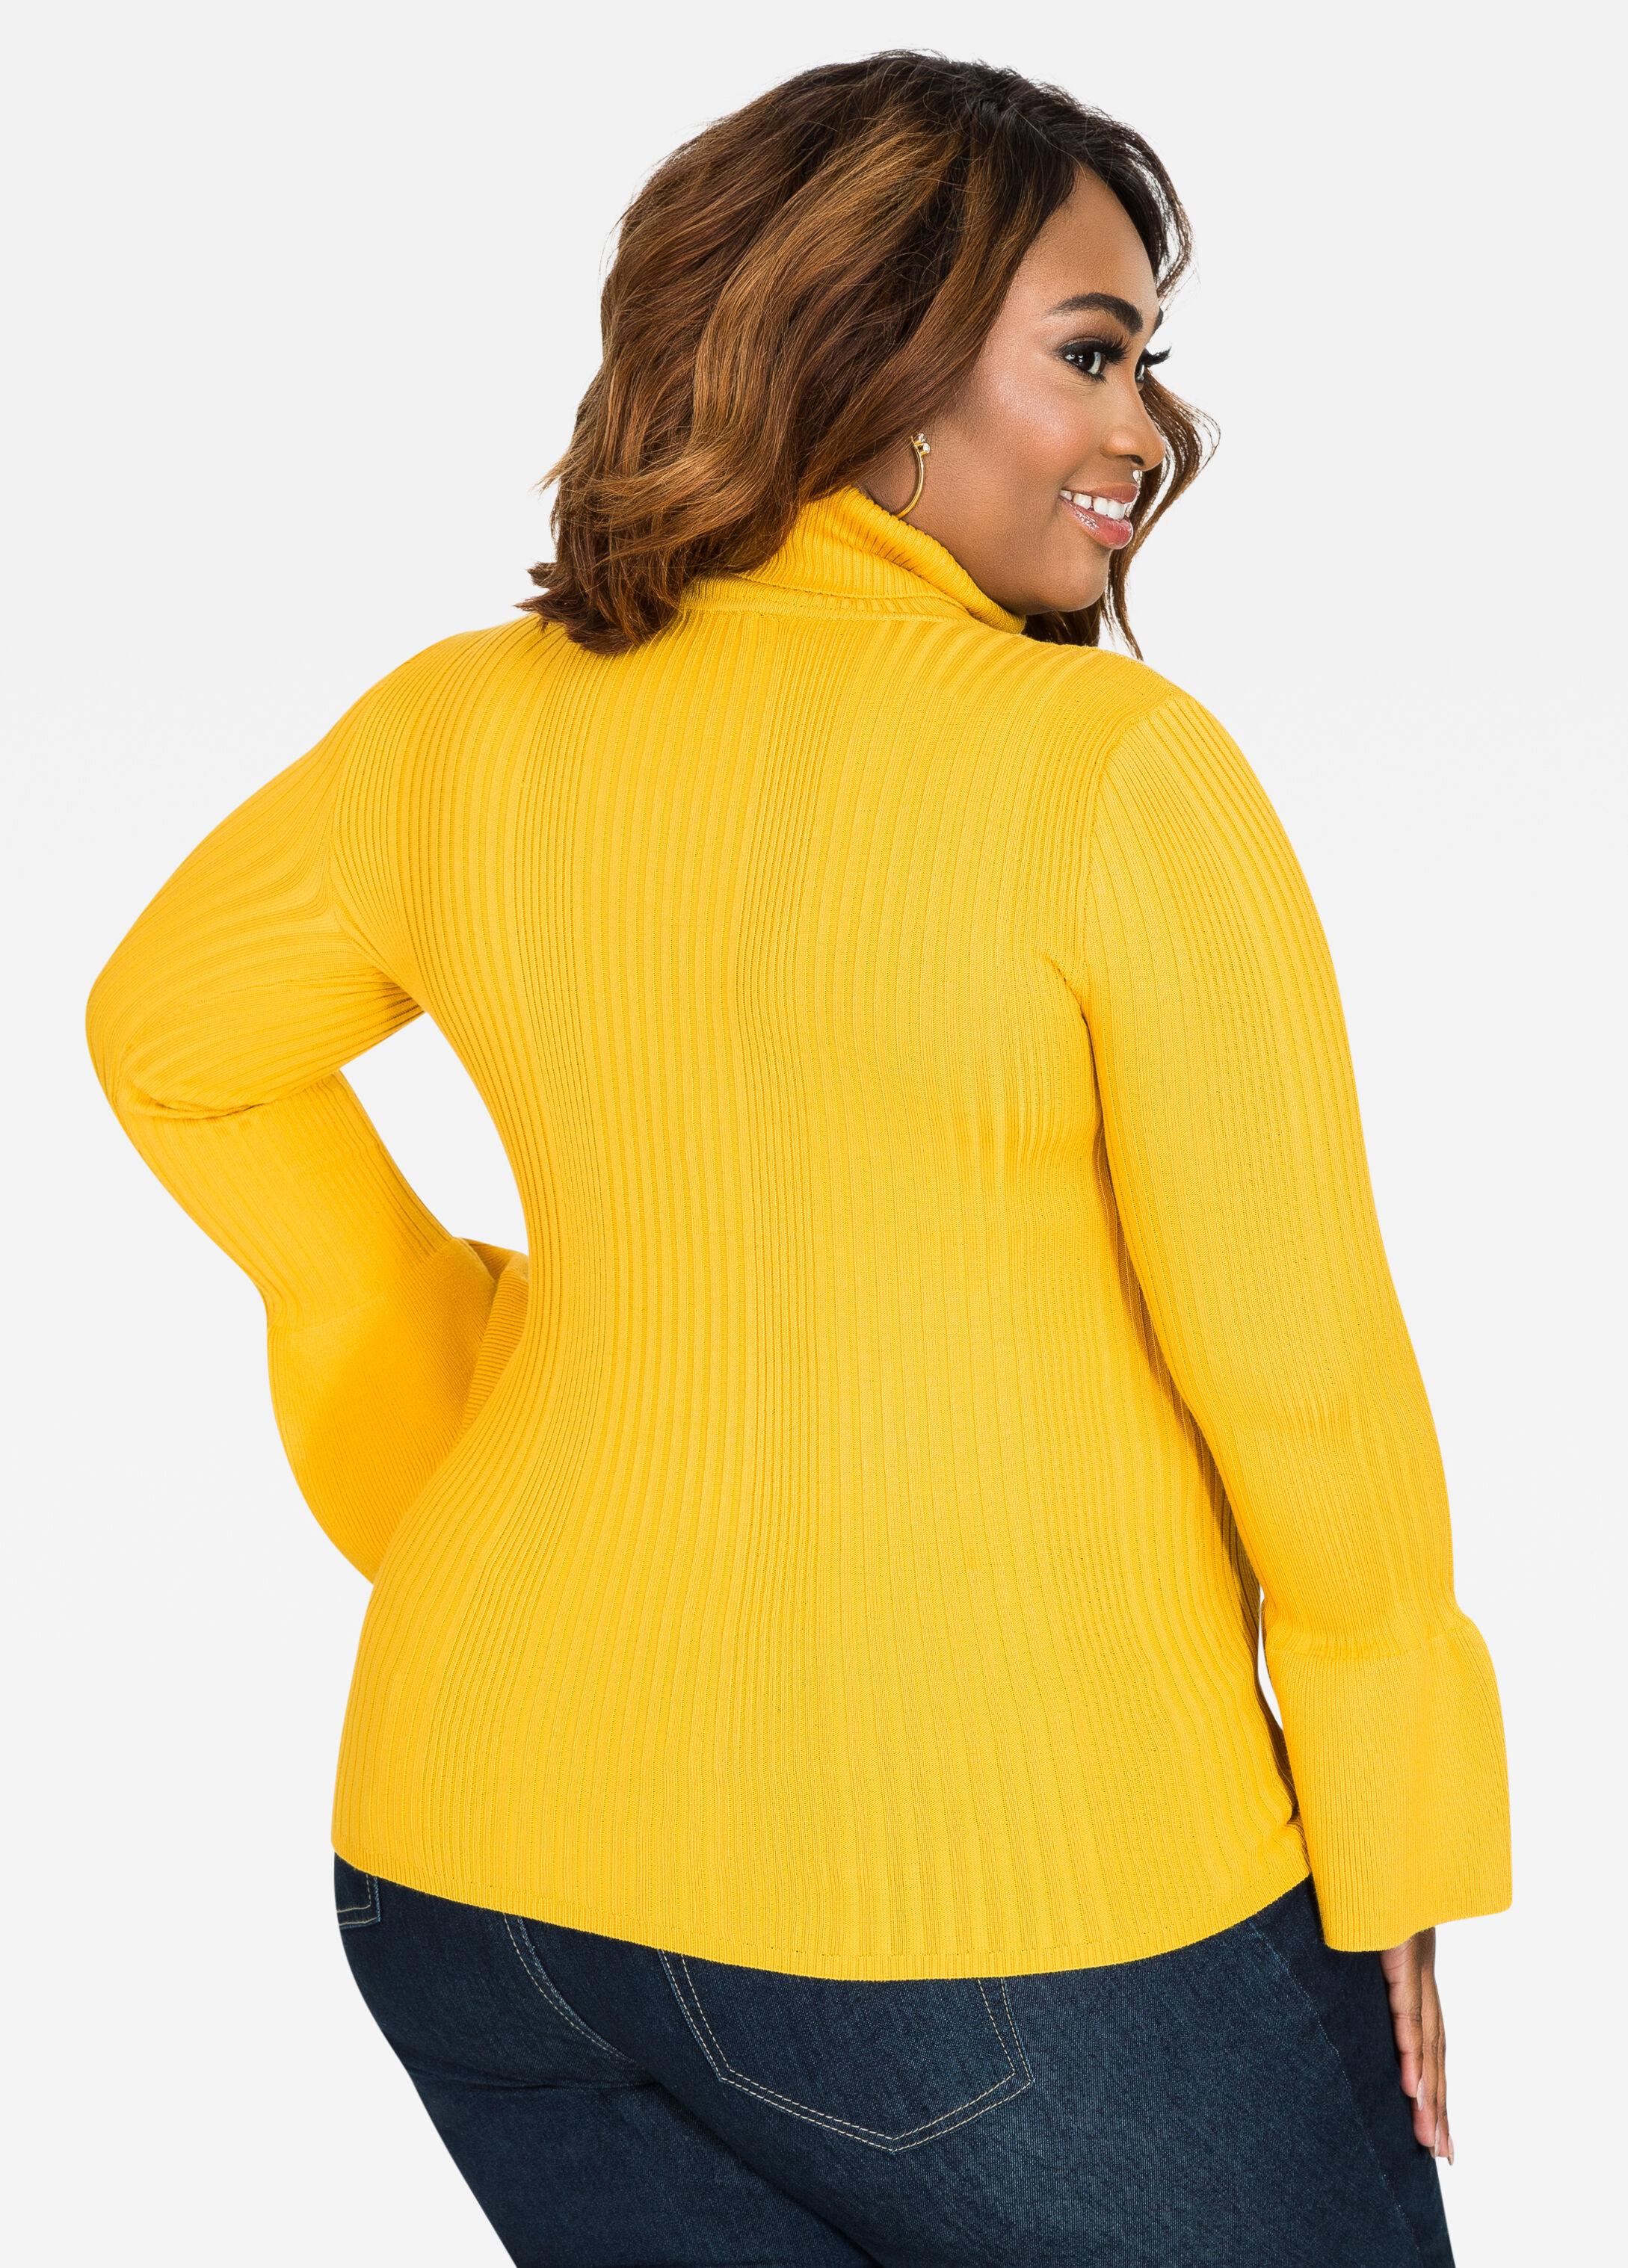 Womens Turtleneck Sweaters